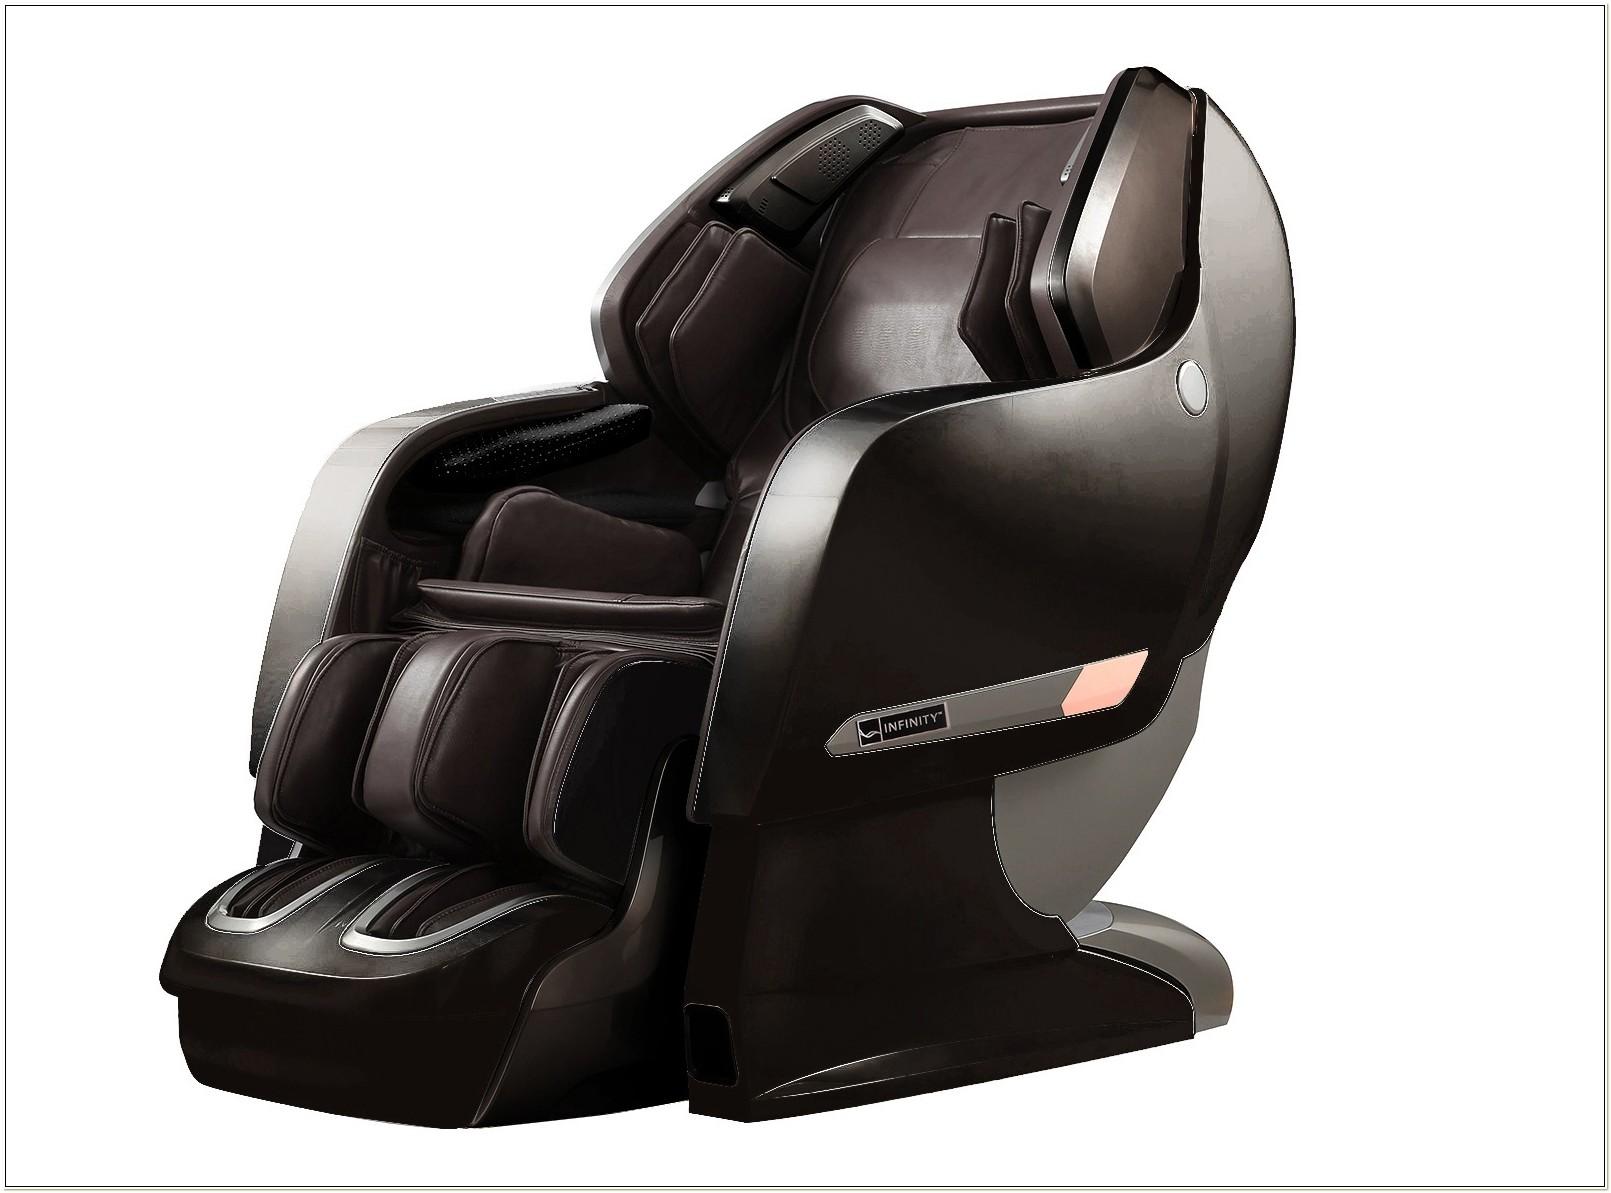 Infinite Therapeutics Massage Chair